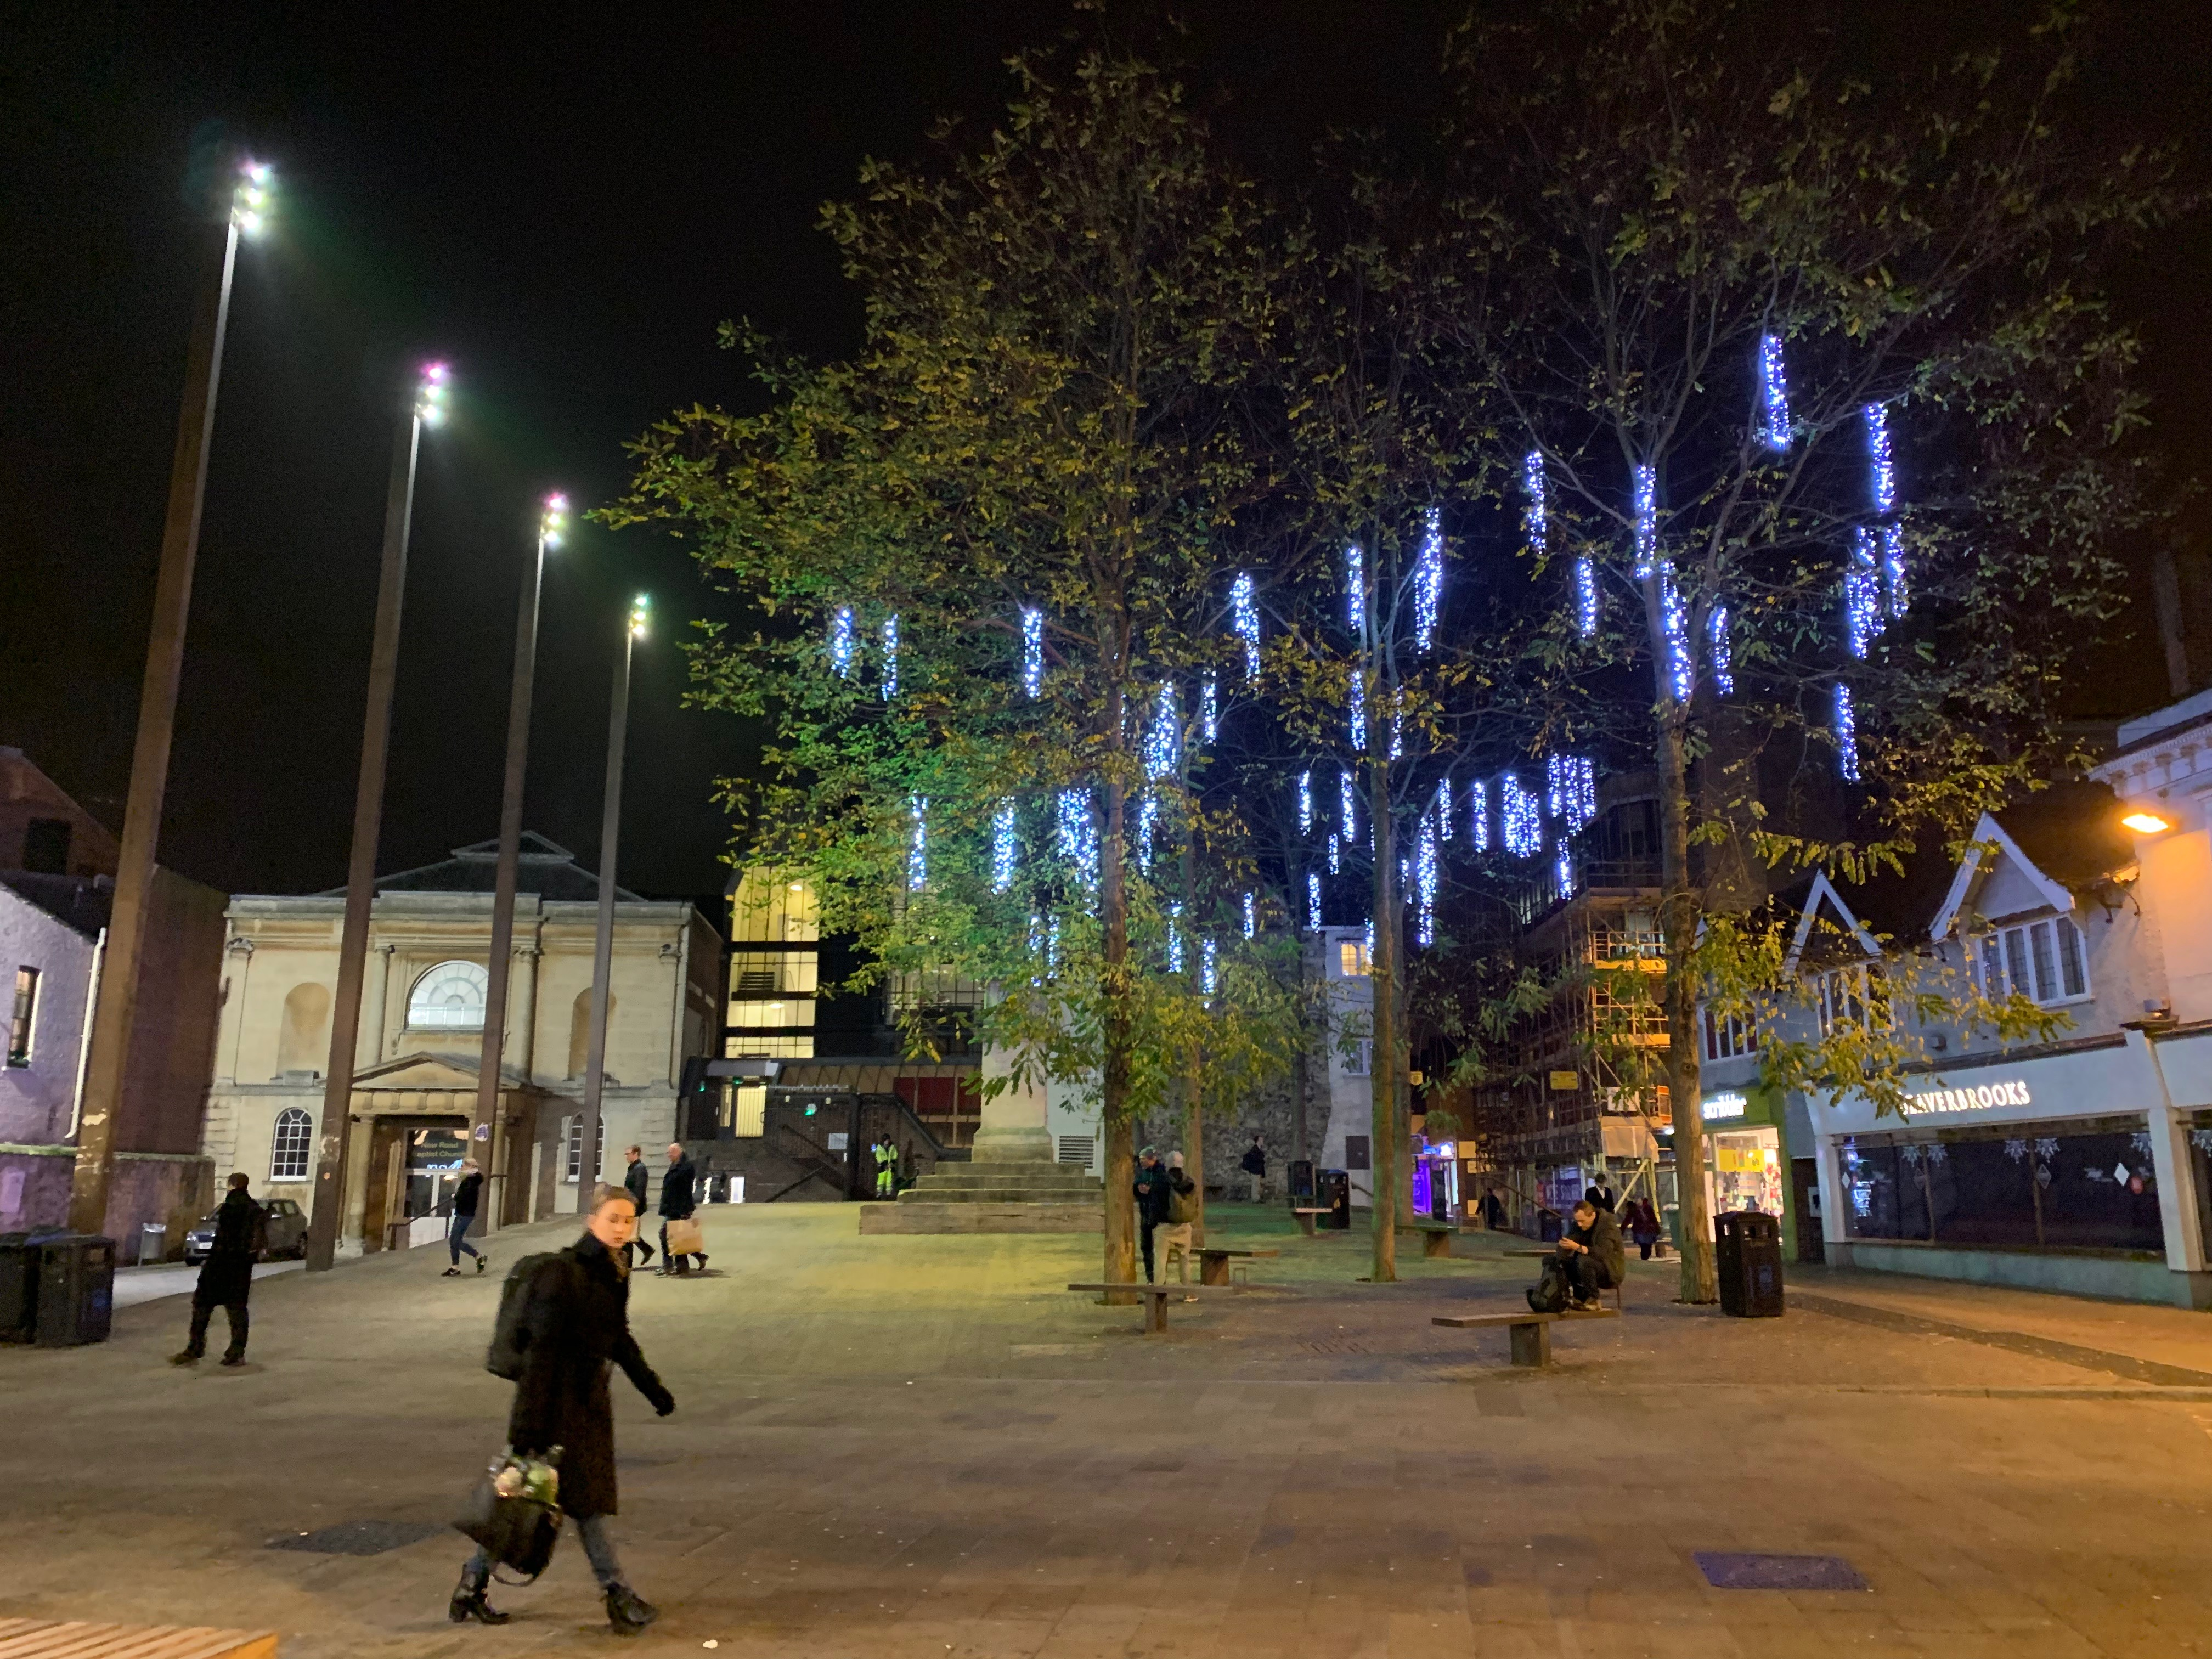 Seasonal lighting in Oxford, England, on Thursday, Nov. 22, 2018.